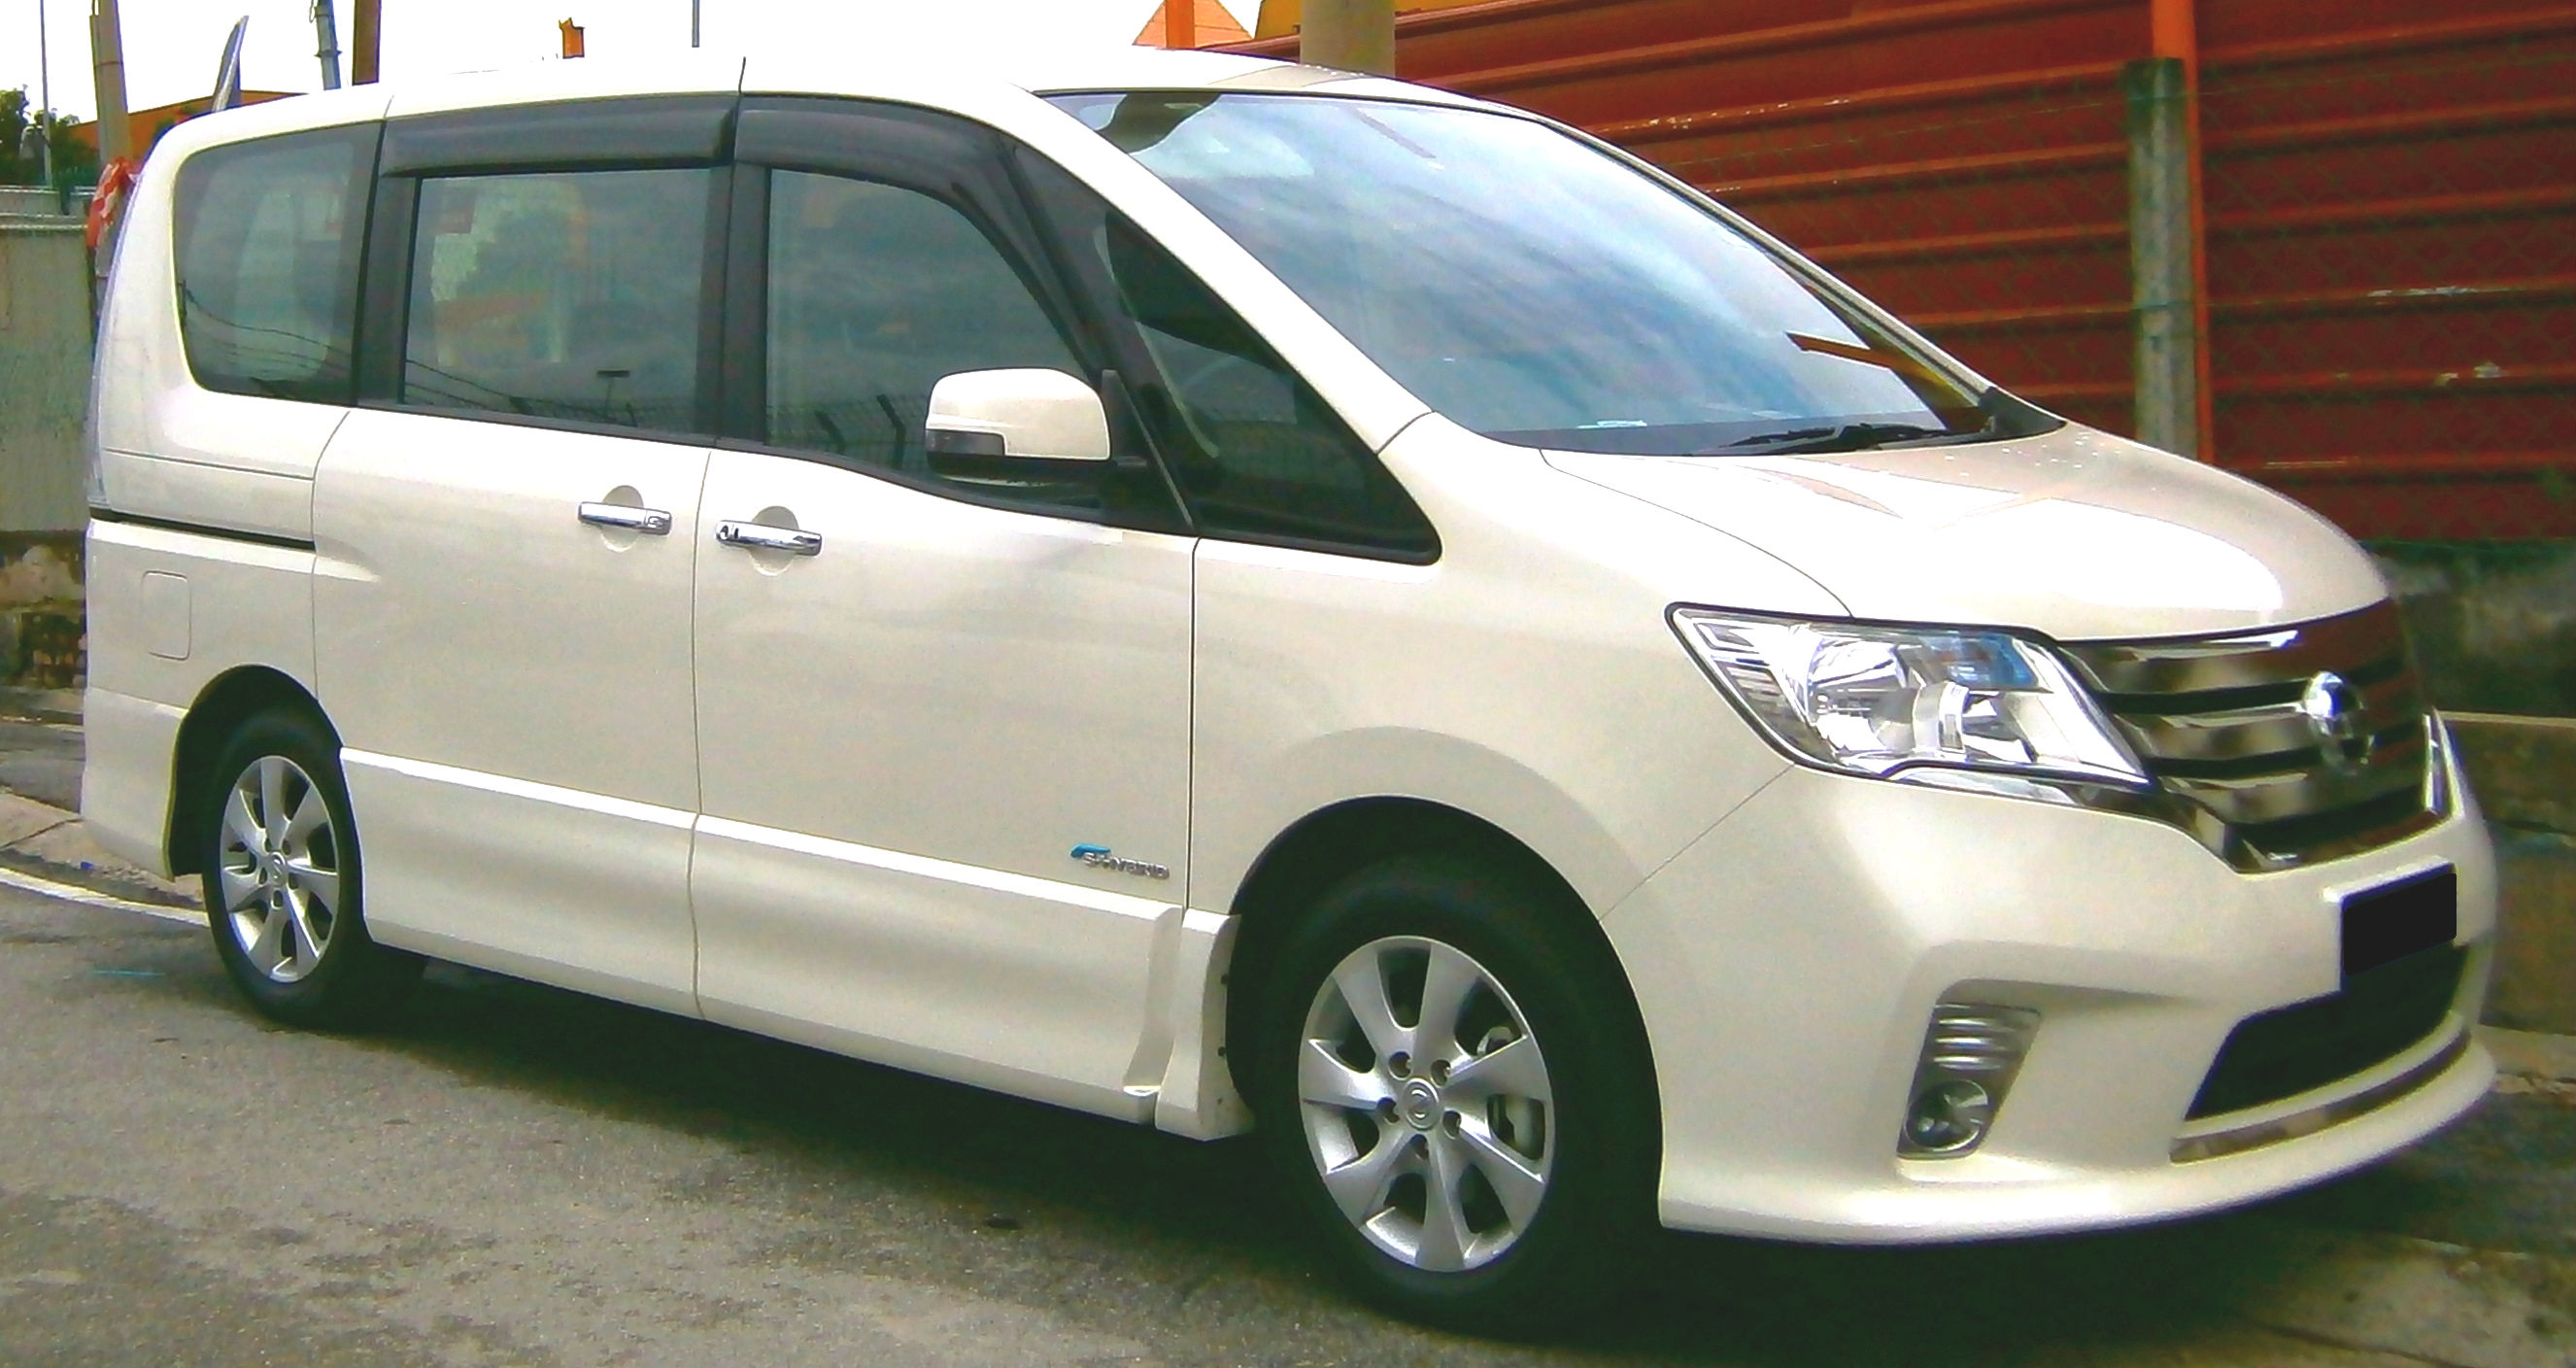 Indonesian Rupiah To Usd Kkday Only Off Peak Season.wa Class 8 Seater Car Rental